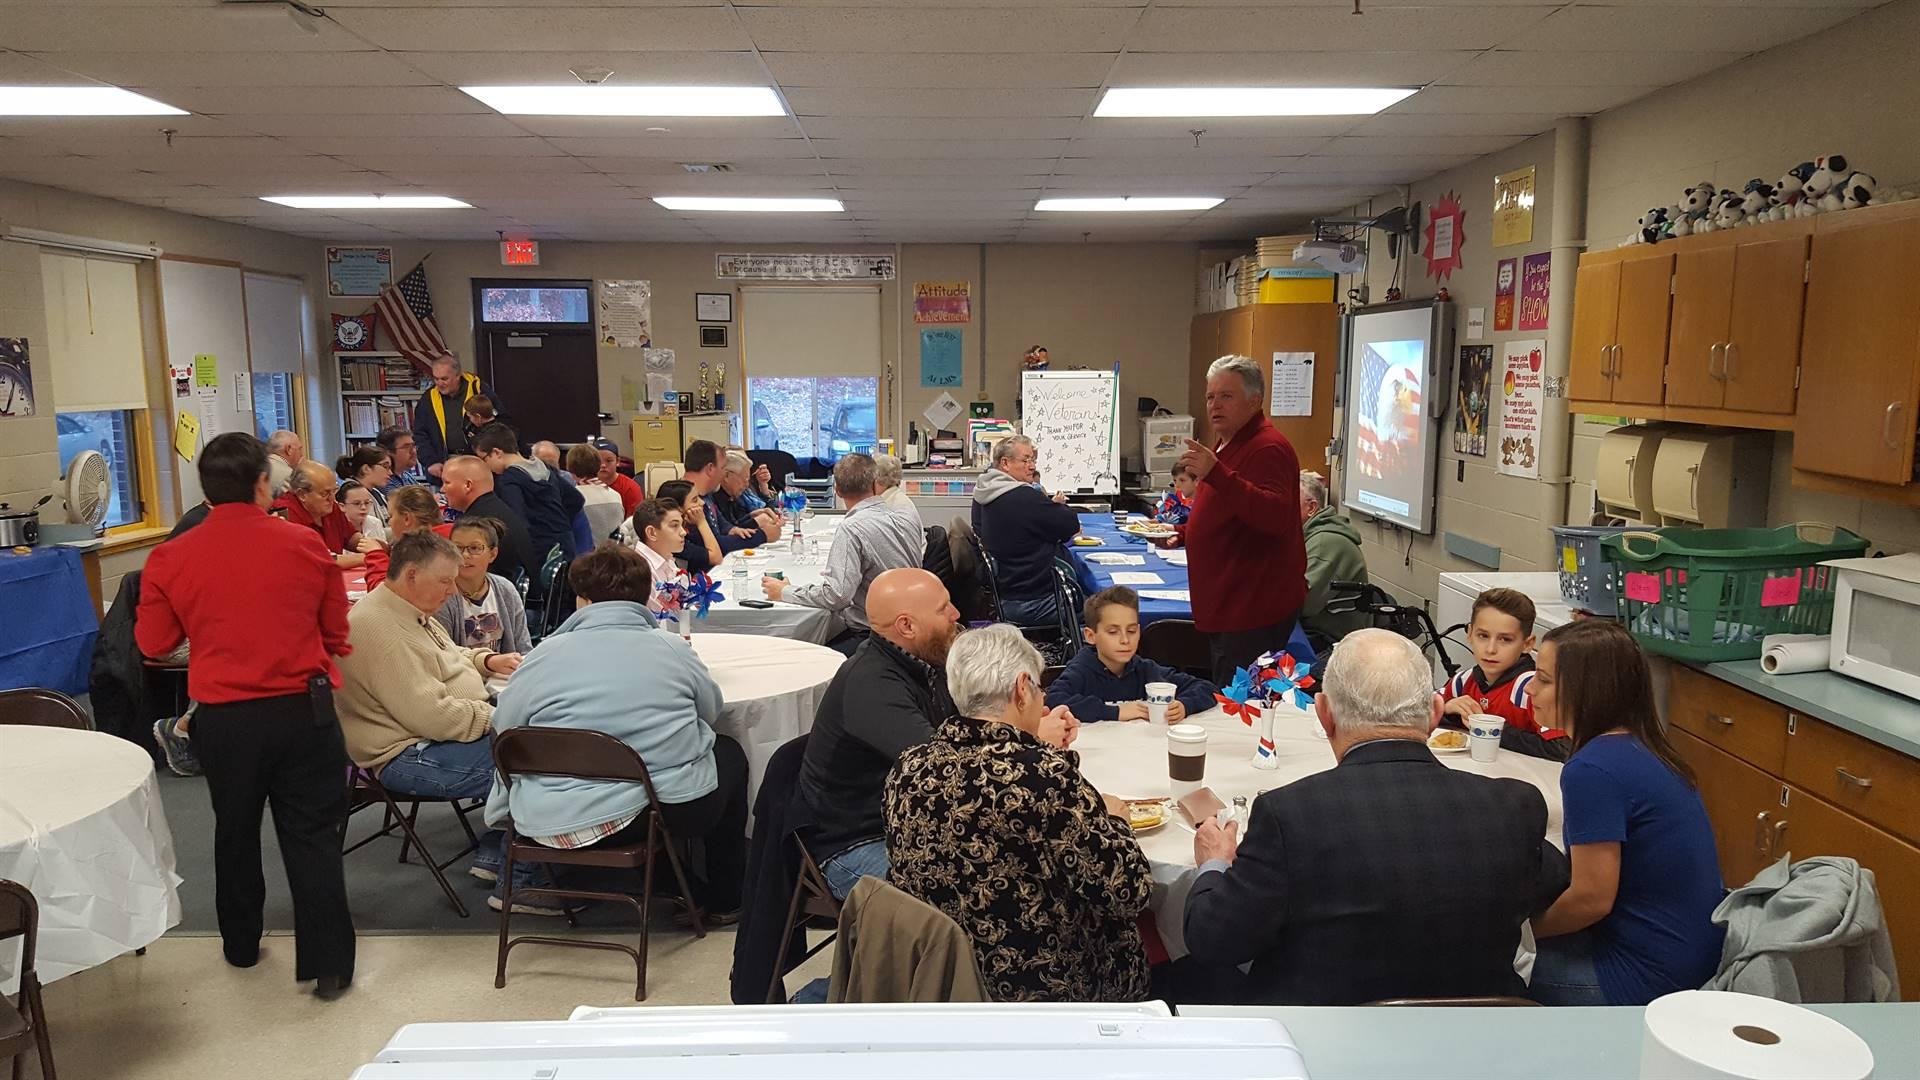 2017 Veterans Day Breakfast at LMS